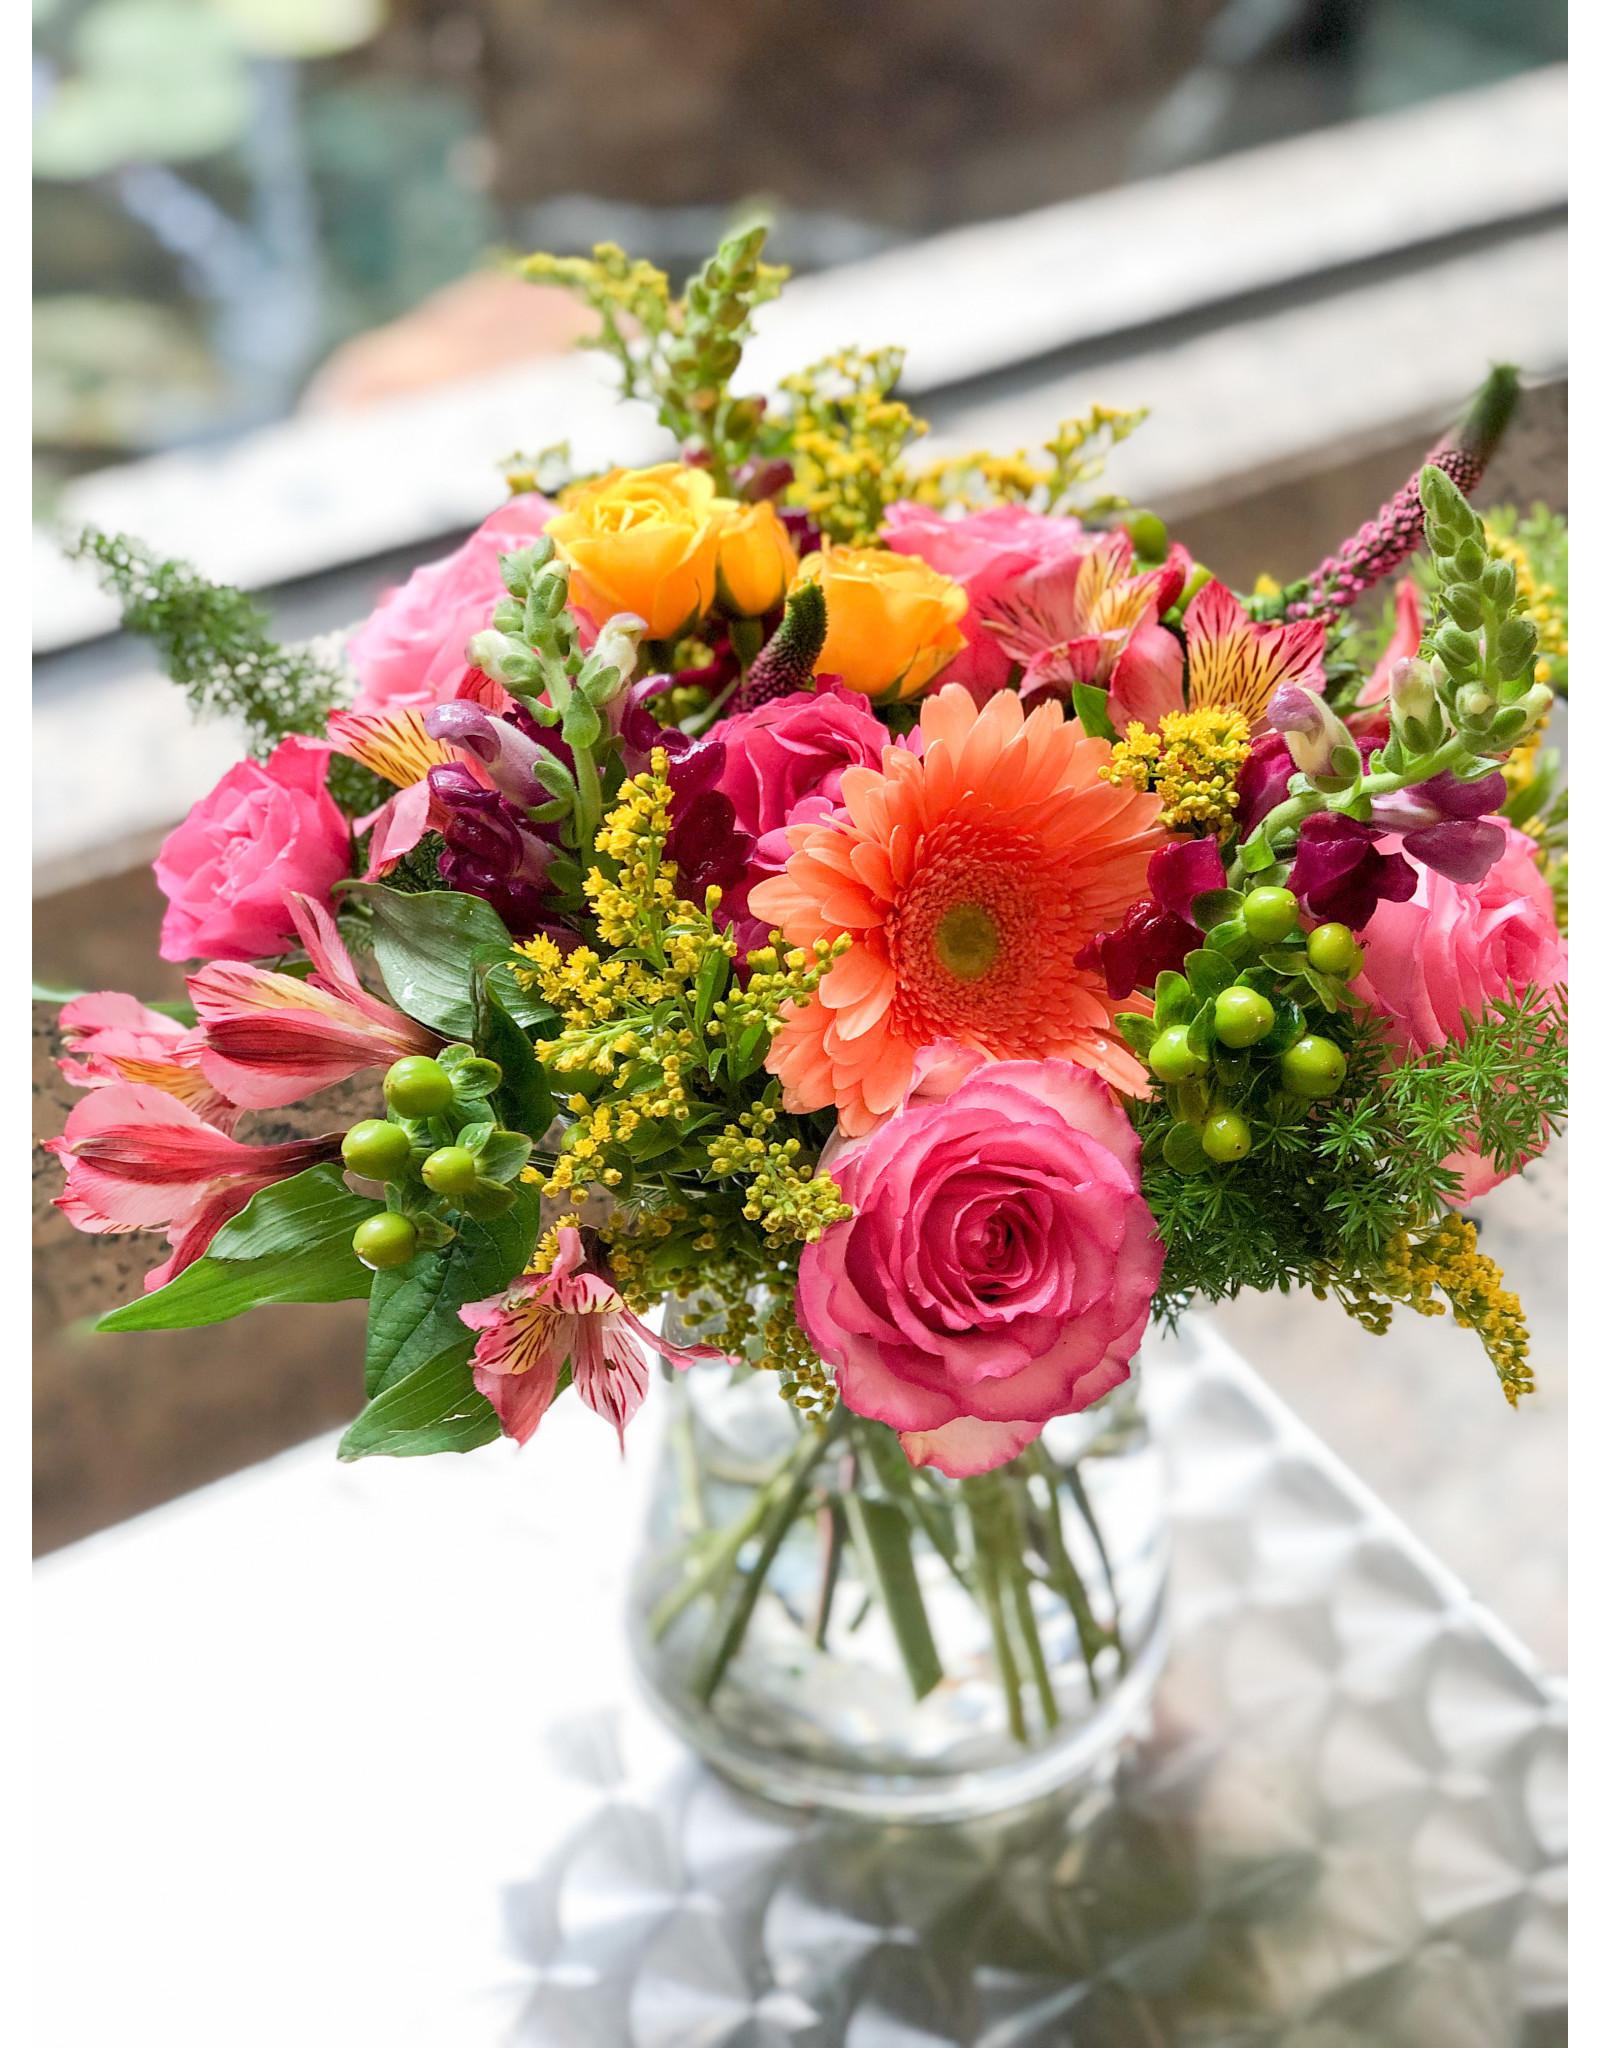 Charming $50 Vase Floral Arrangement